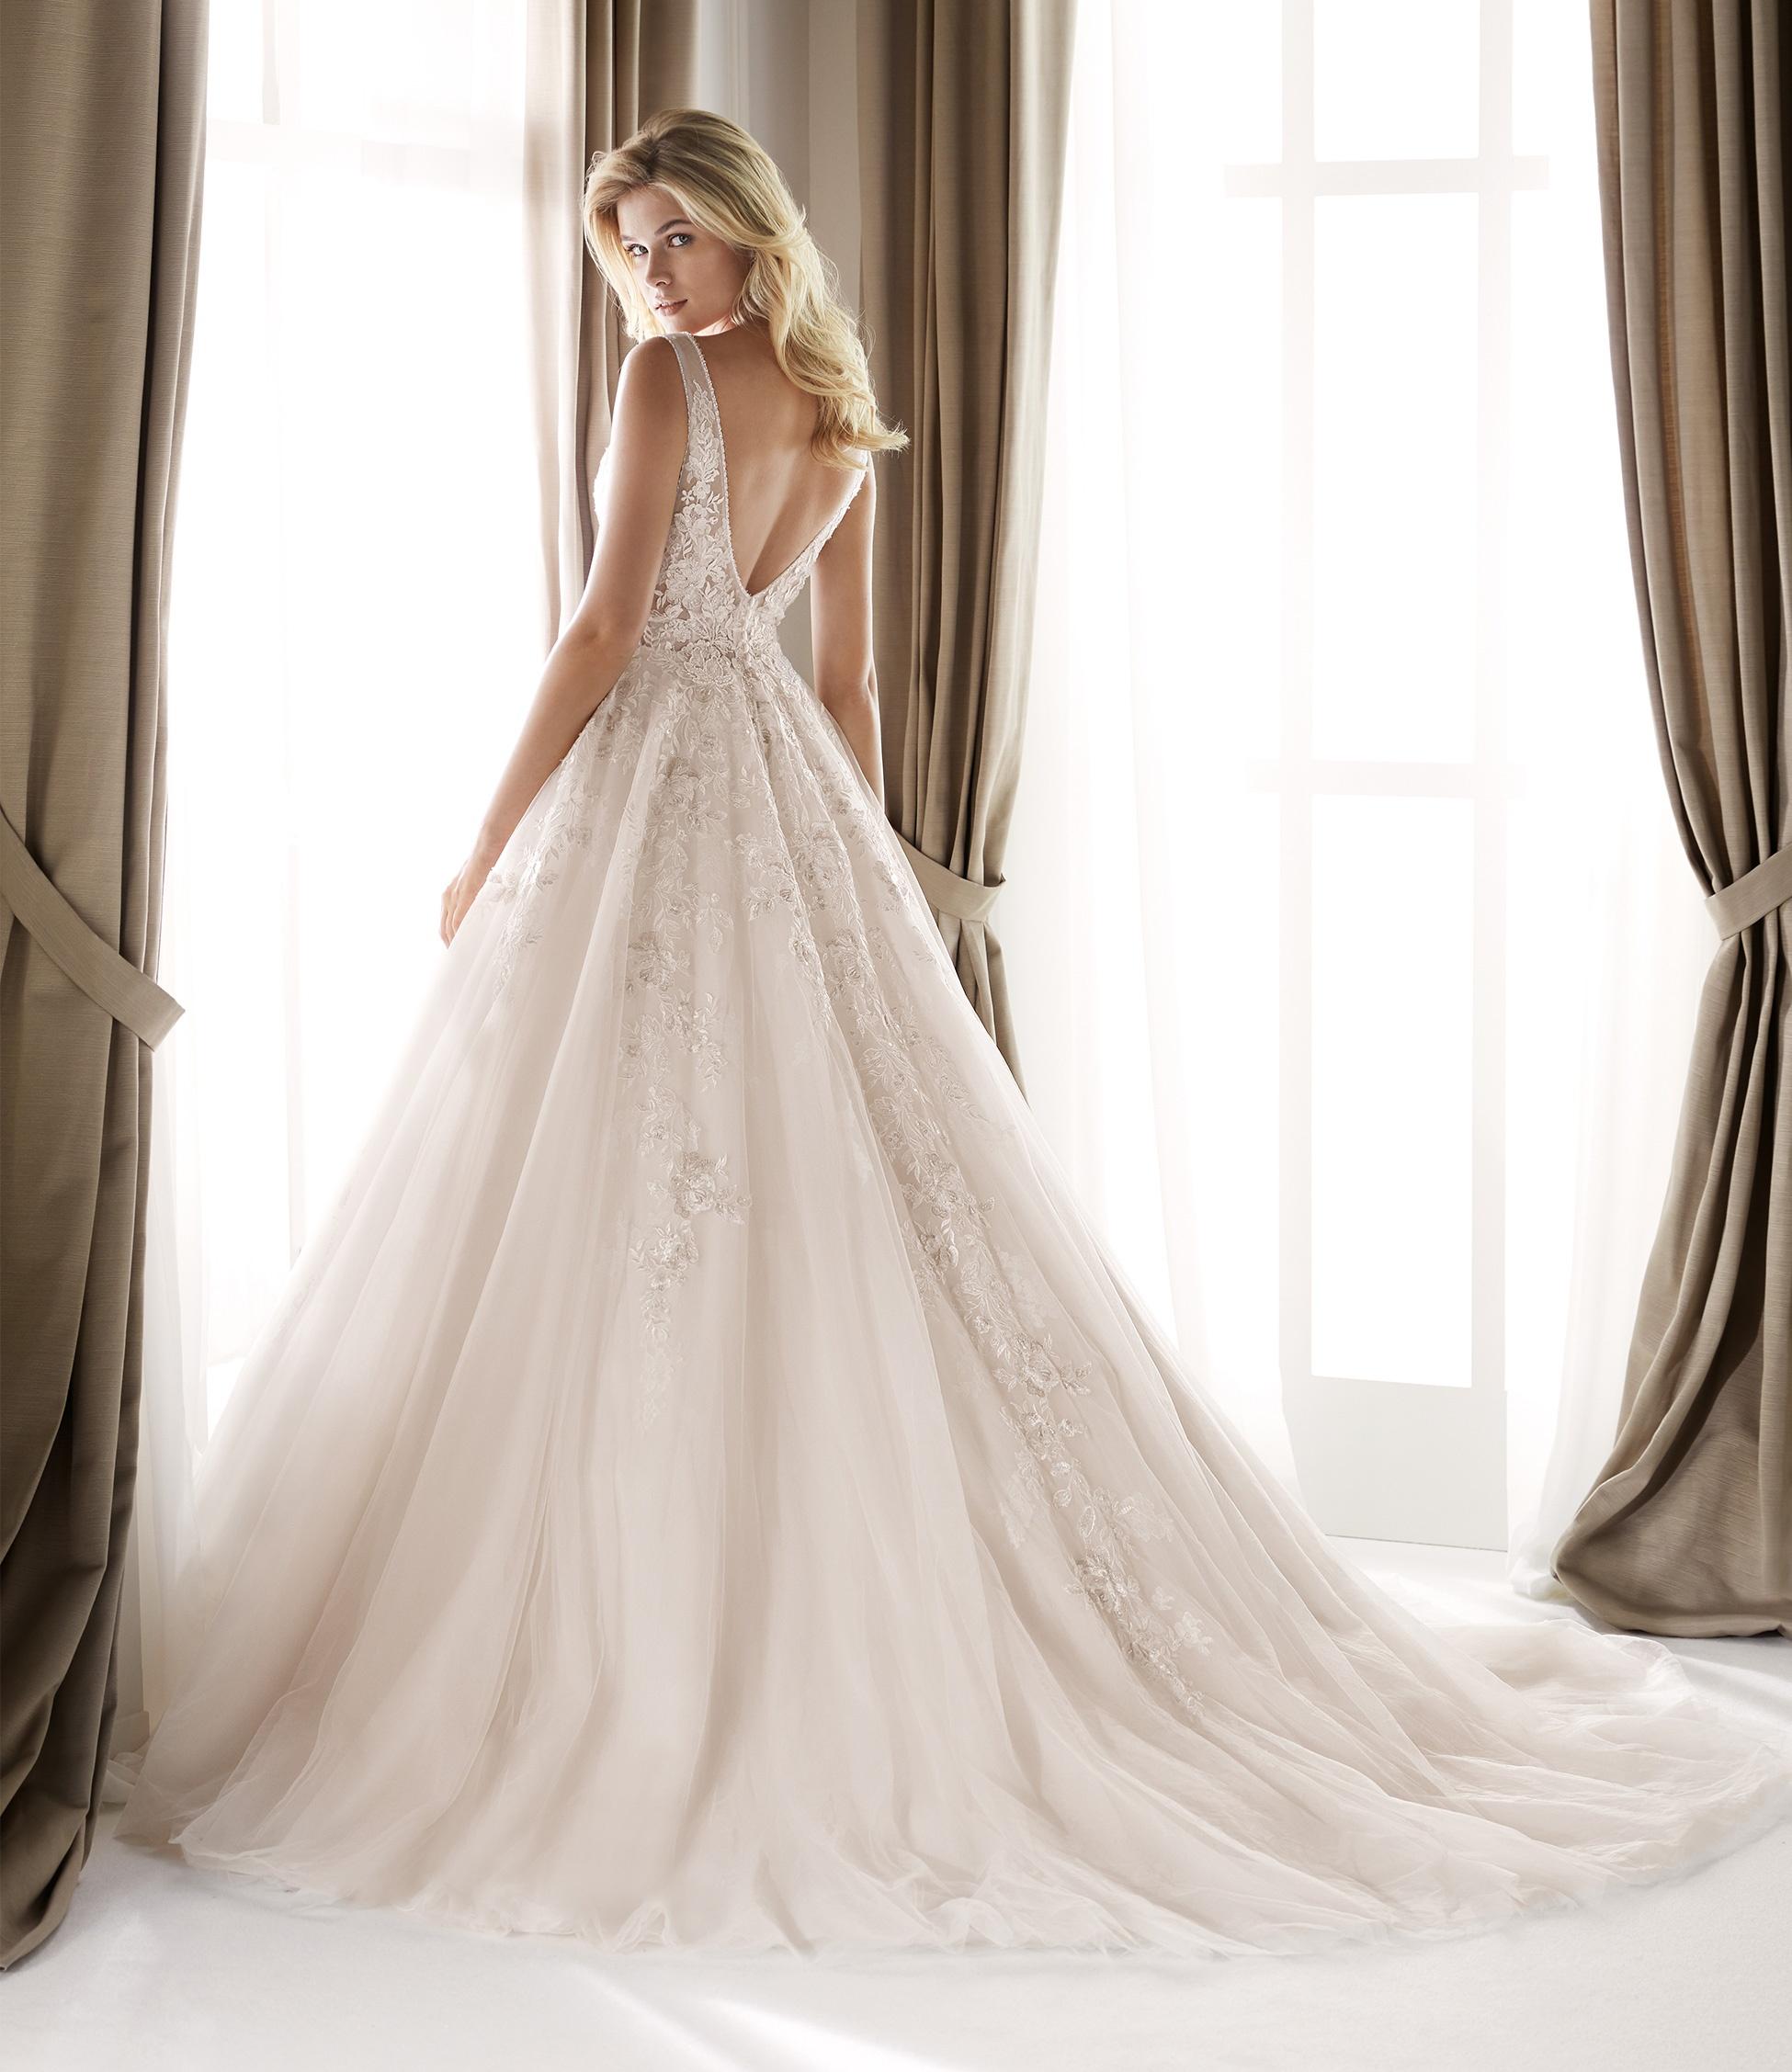 nicole-spose-NIA20221-Nicole-moda-sposa-2020-141.jpg